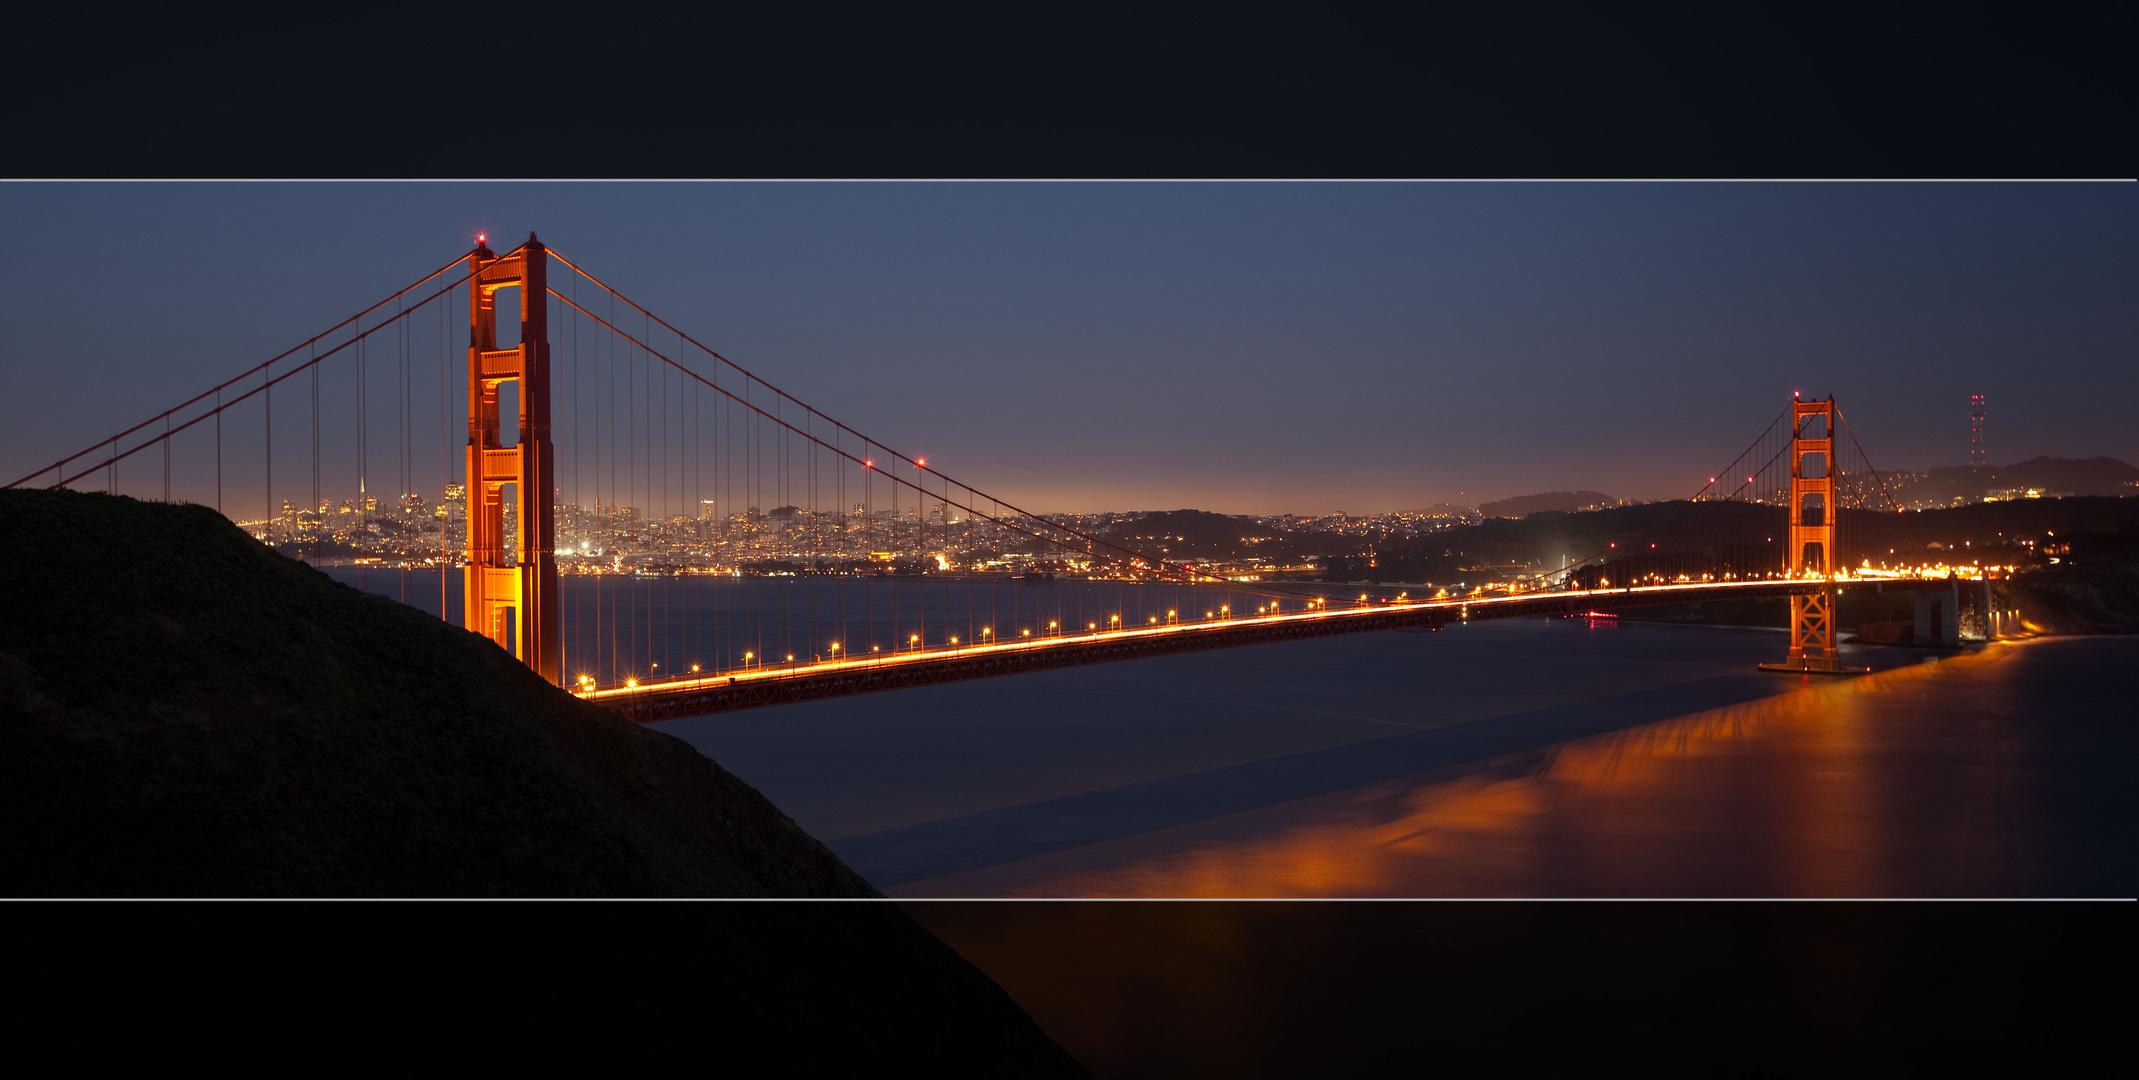 goldengate bridge bei nacht foto bild north america. Black Bedroom Furniture Sets. Home Design Ideas